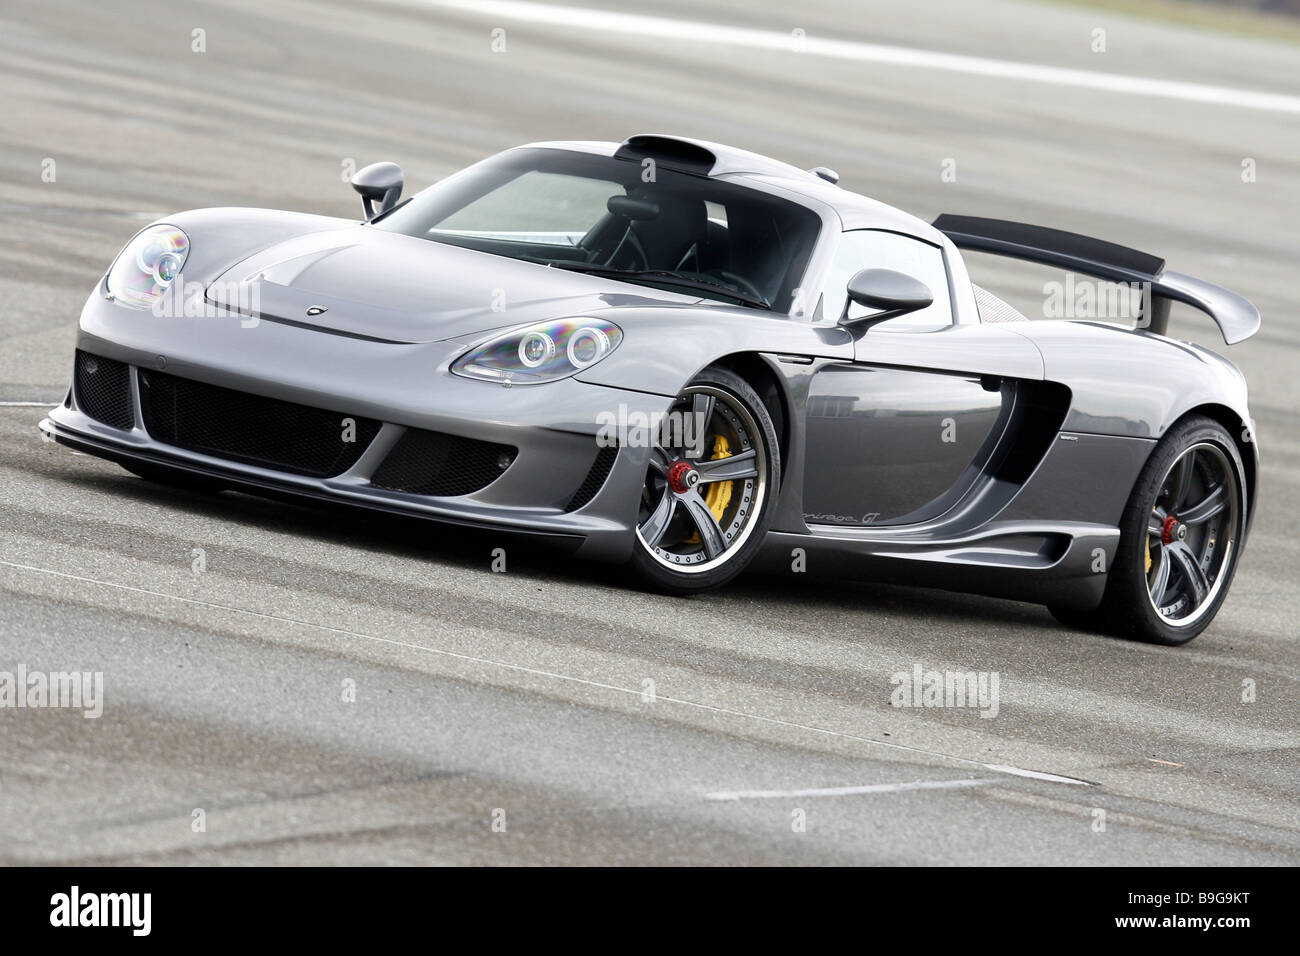 Porsche Gemballa Mirage Silver Series Vehicle Car Sport Cars Stock